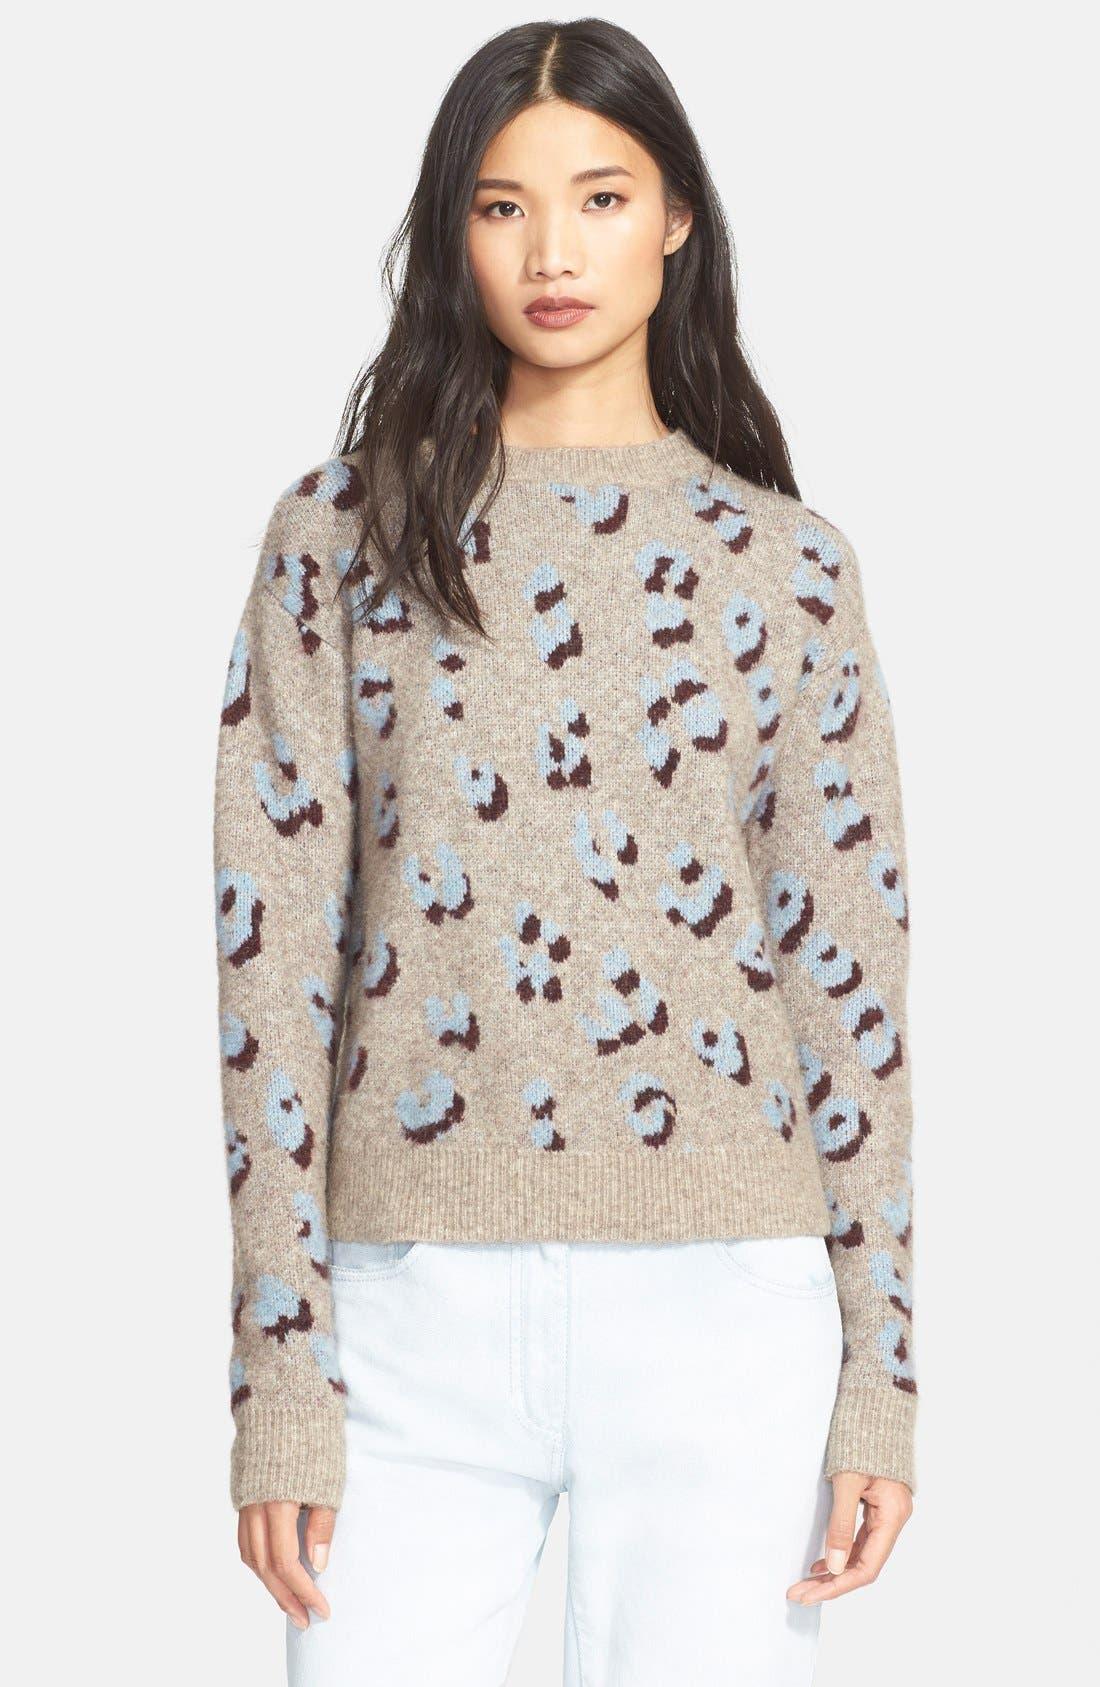 Main Image - 3.1 Phillip Lim Leopard Jacquard Sweater